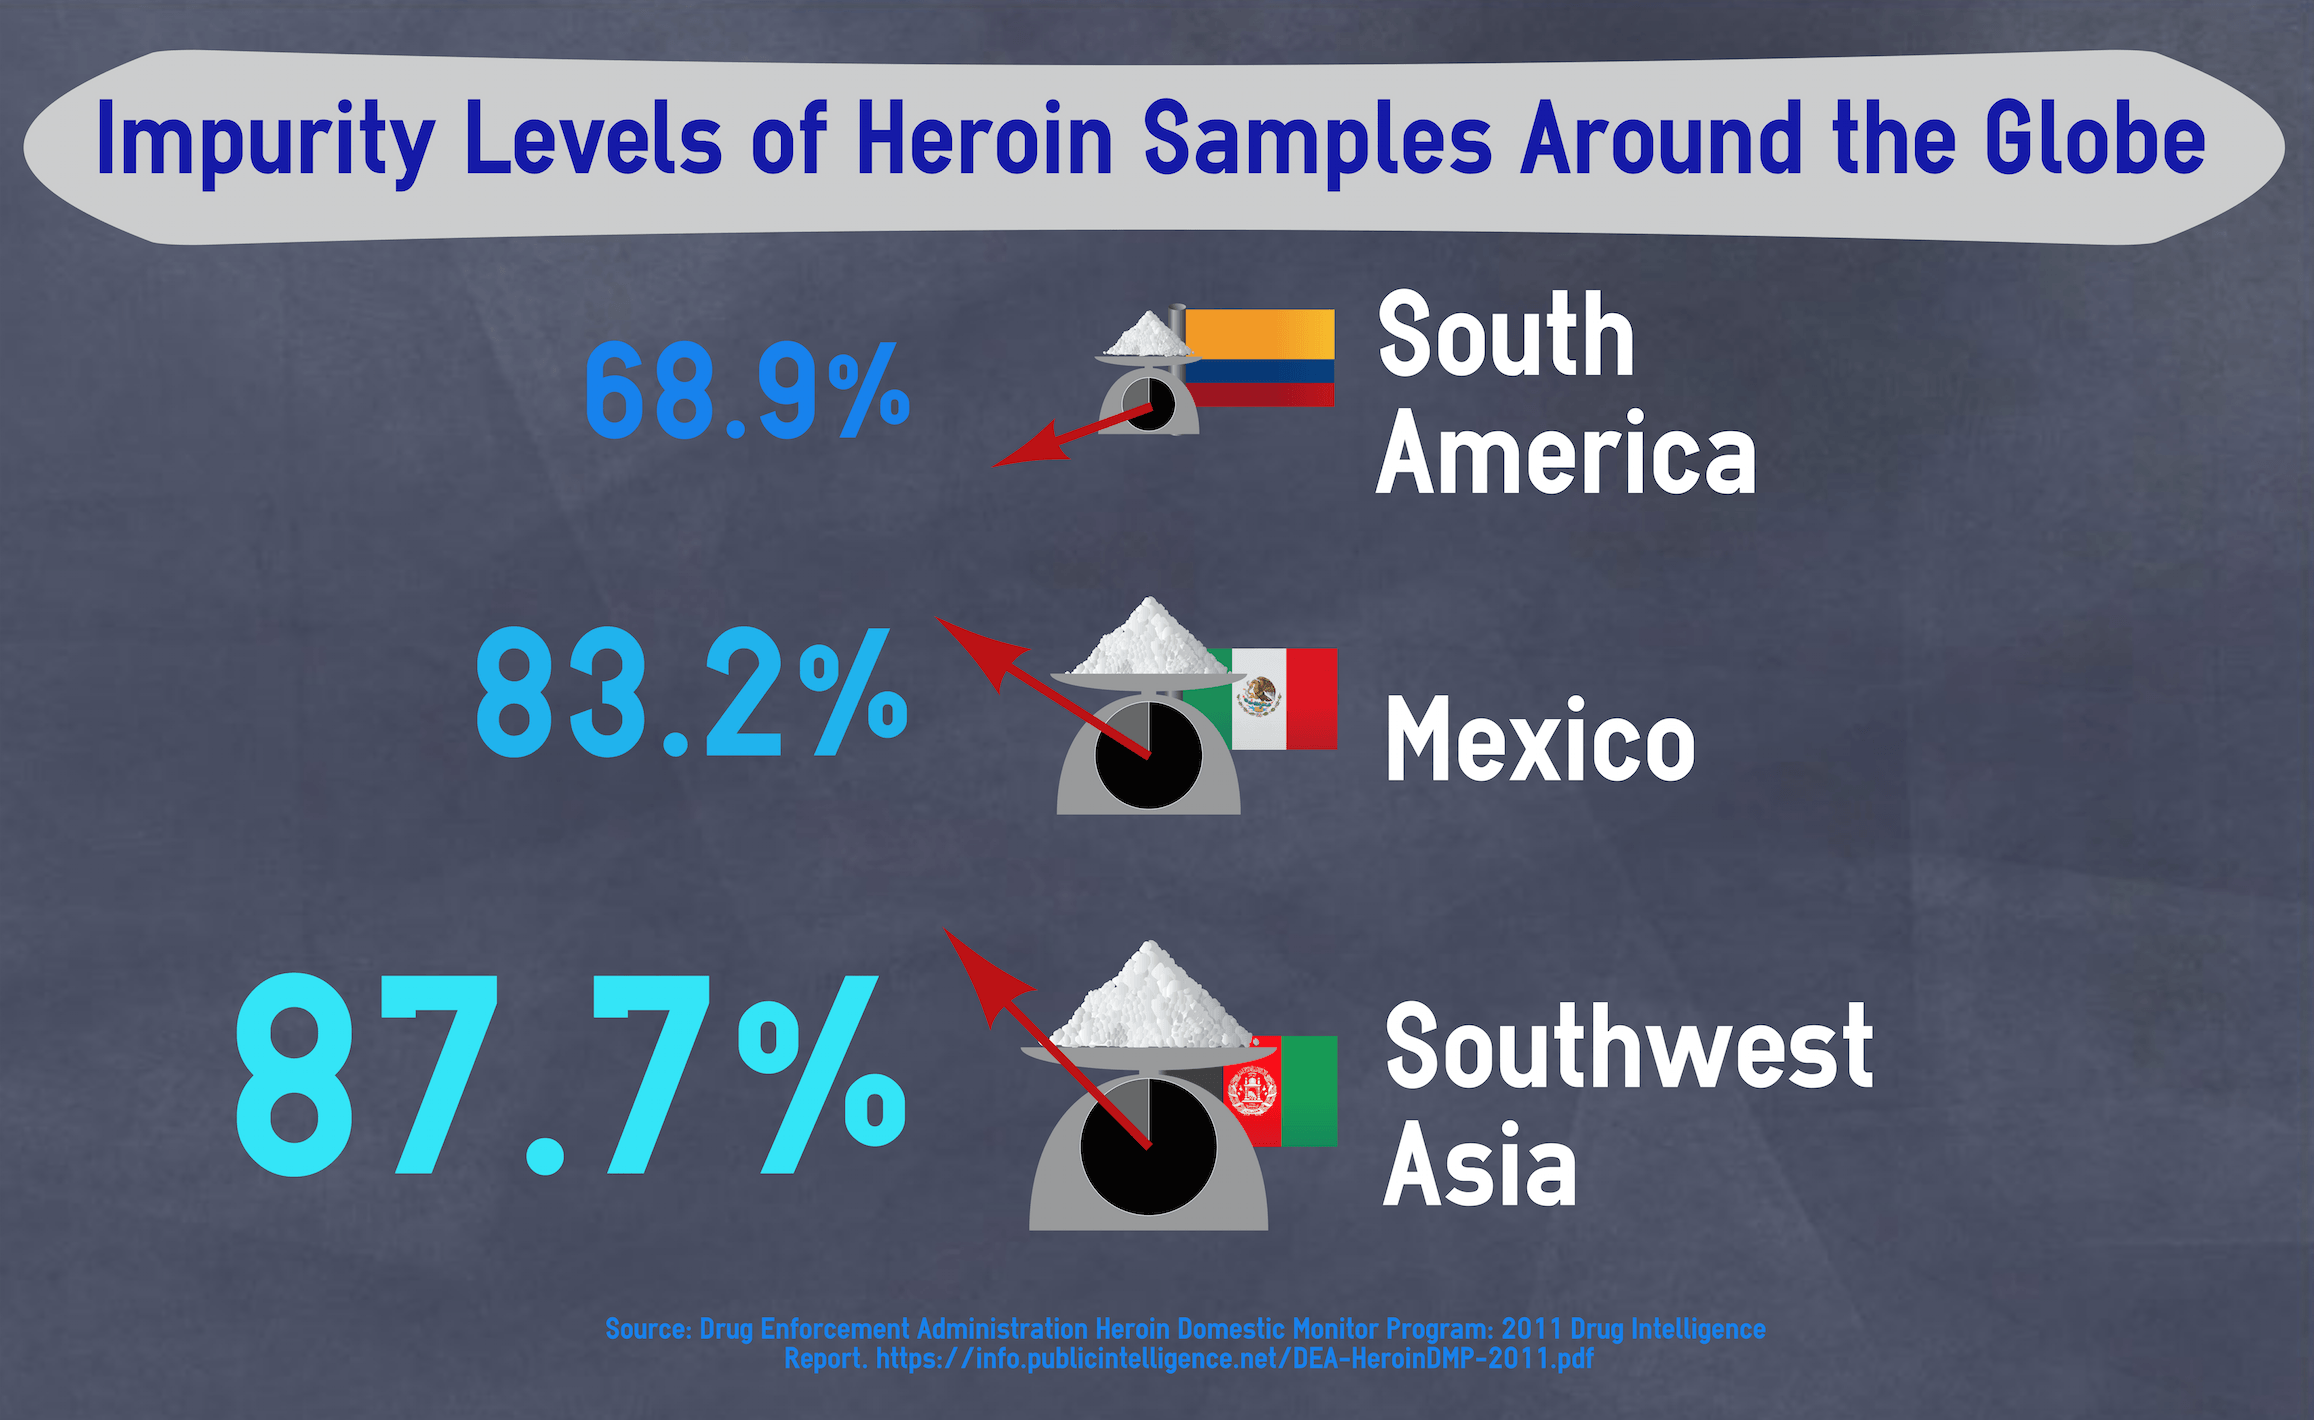 heroin impurities